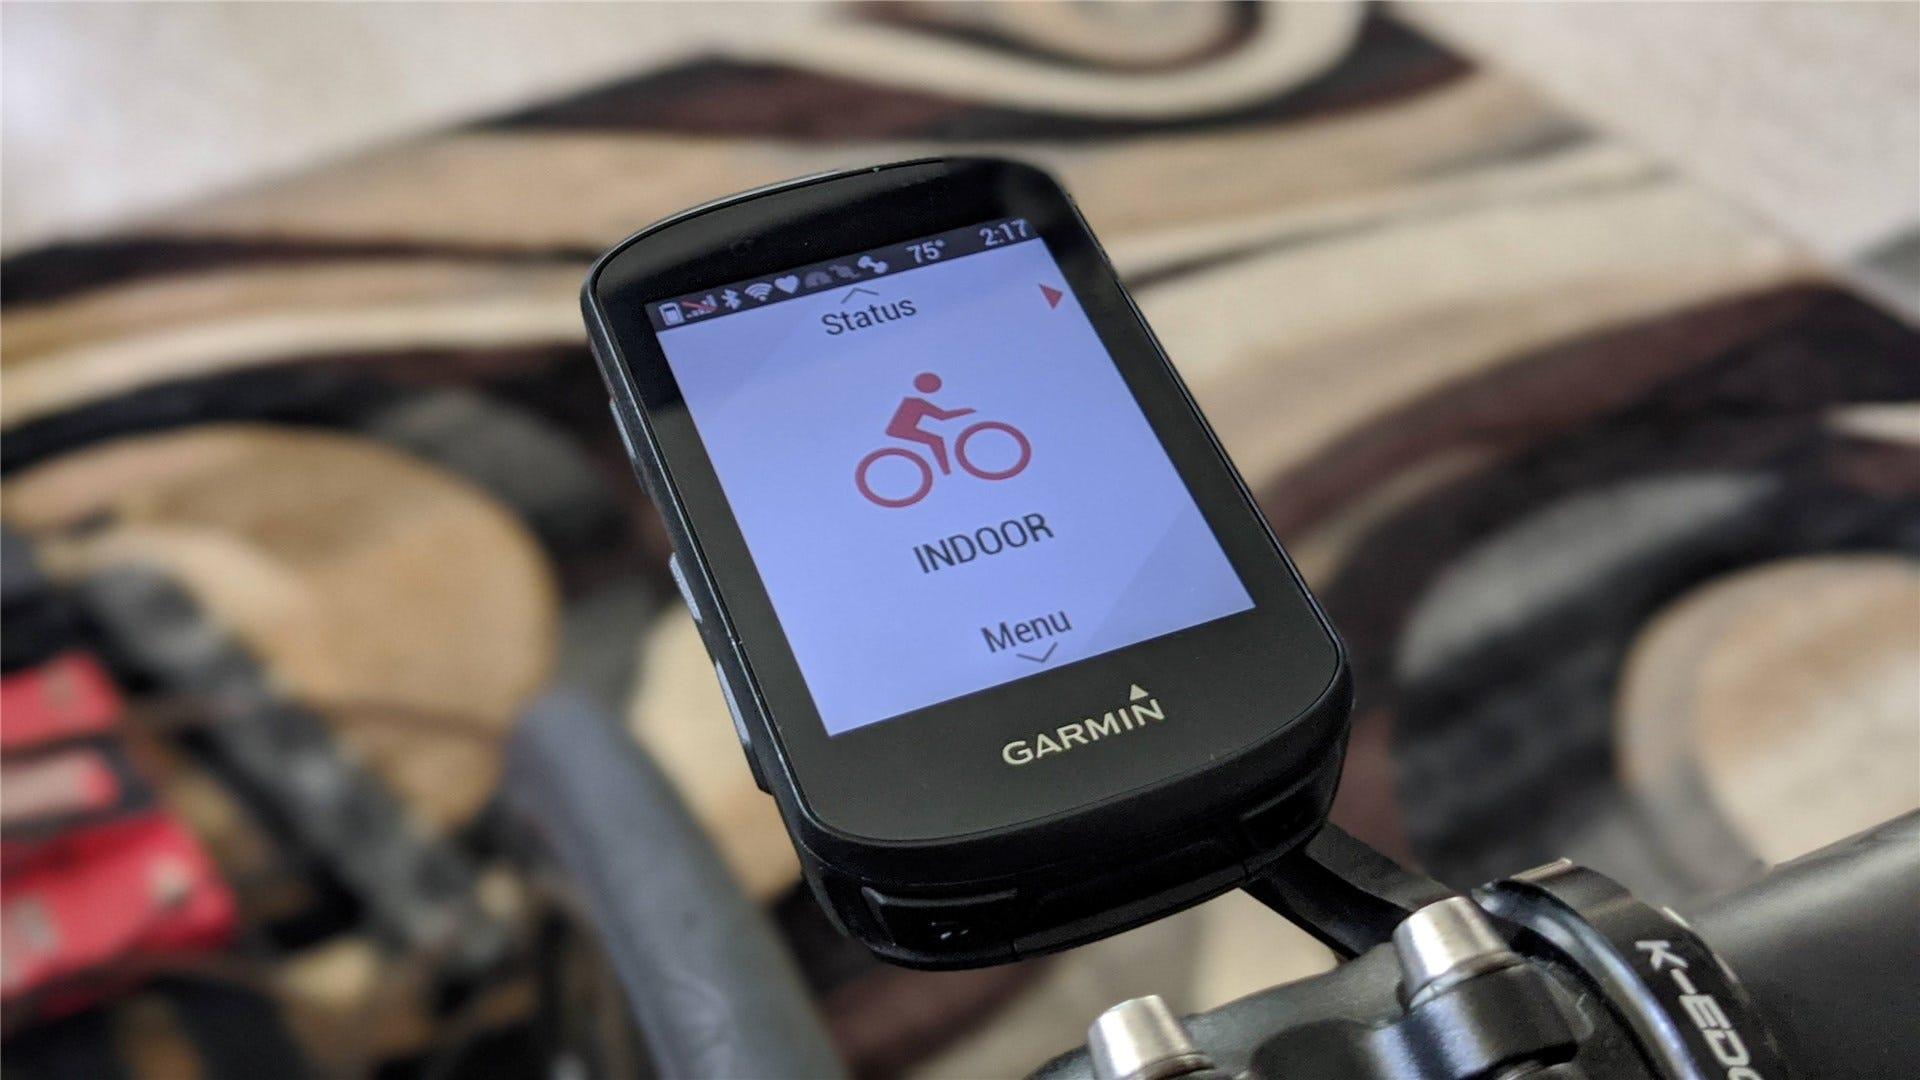 A Garmin Edge 520 bike computer on a K-Edge out-front mount